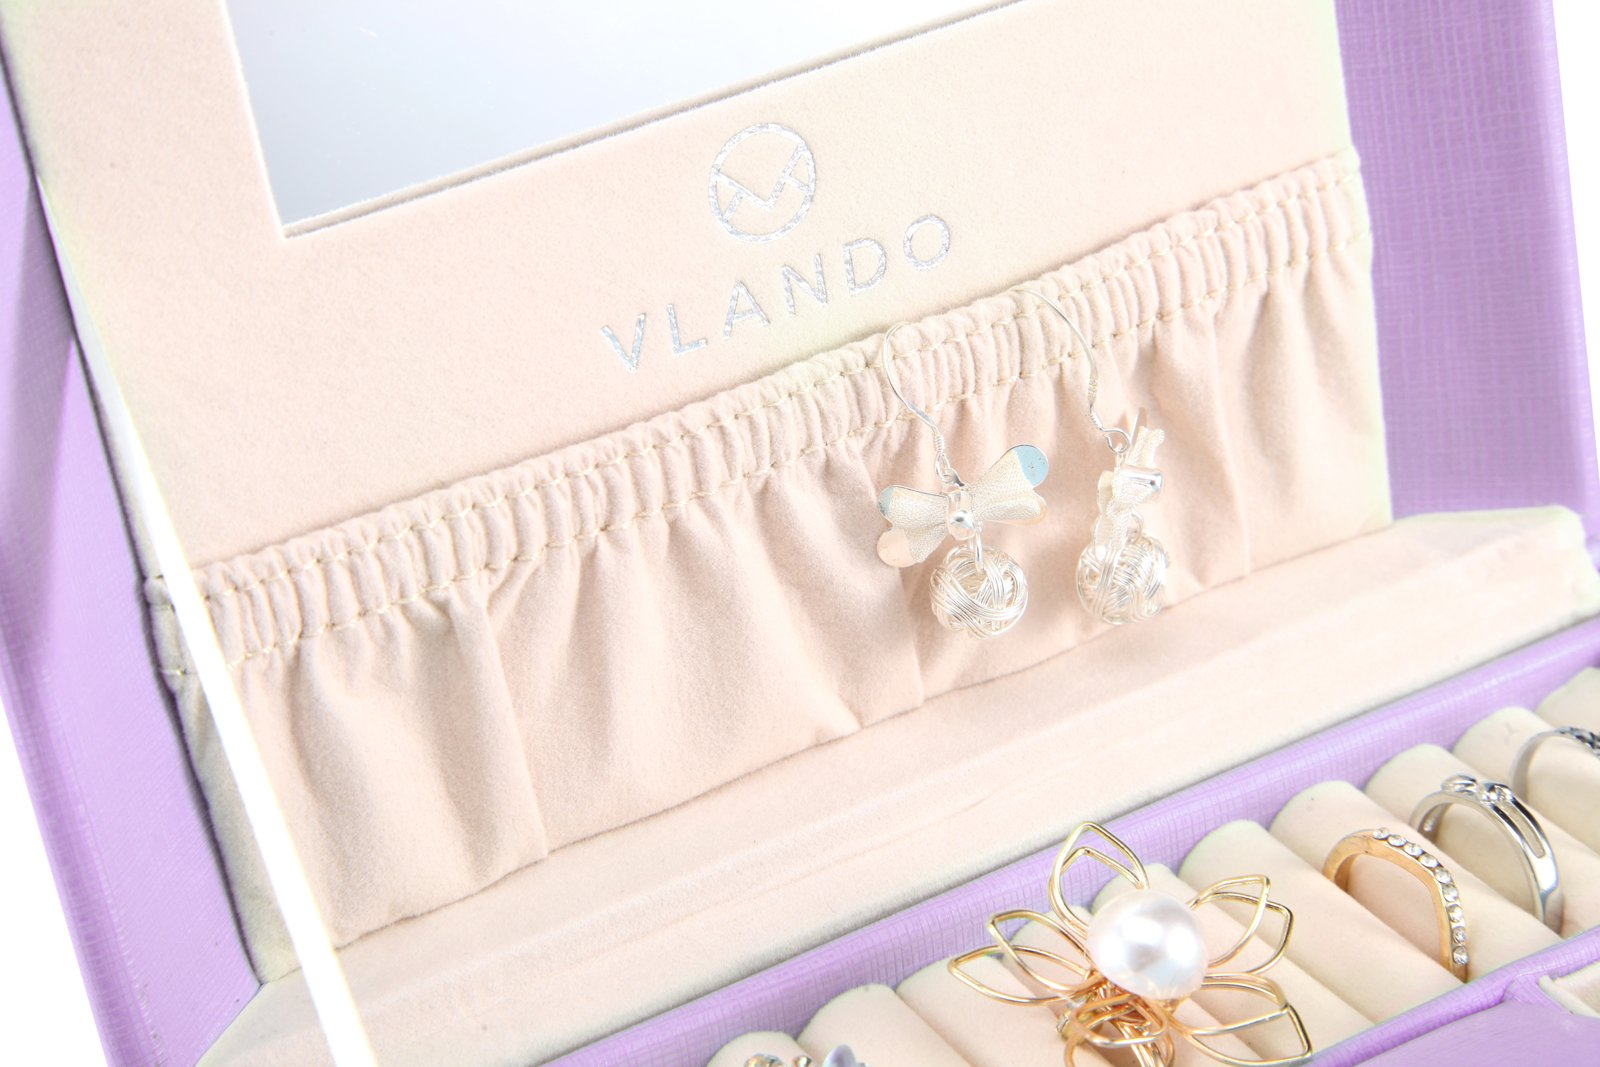 Vlando Princess Style Jewelry Box from Netherlands Design Team, Fabulous Christmas Gift for Girls (Purple) by Vlando (Image #5)